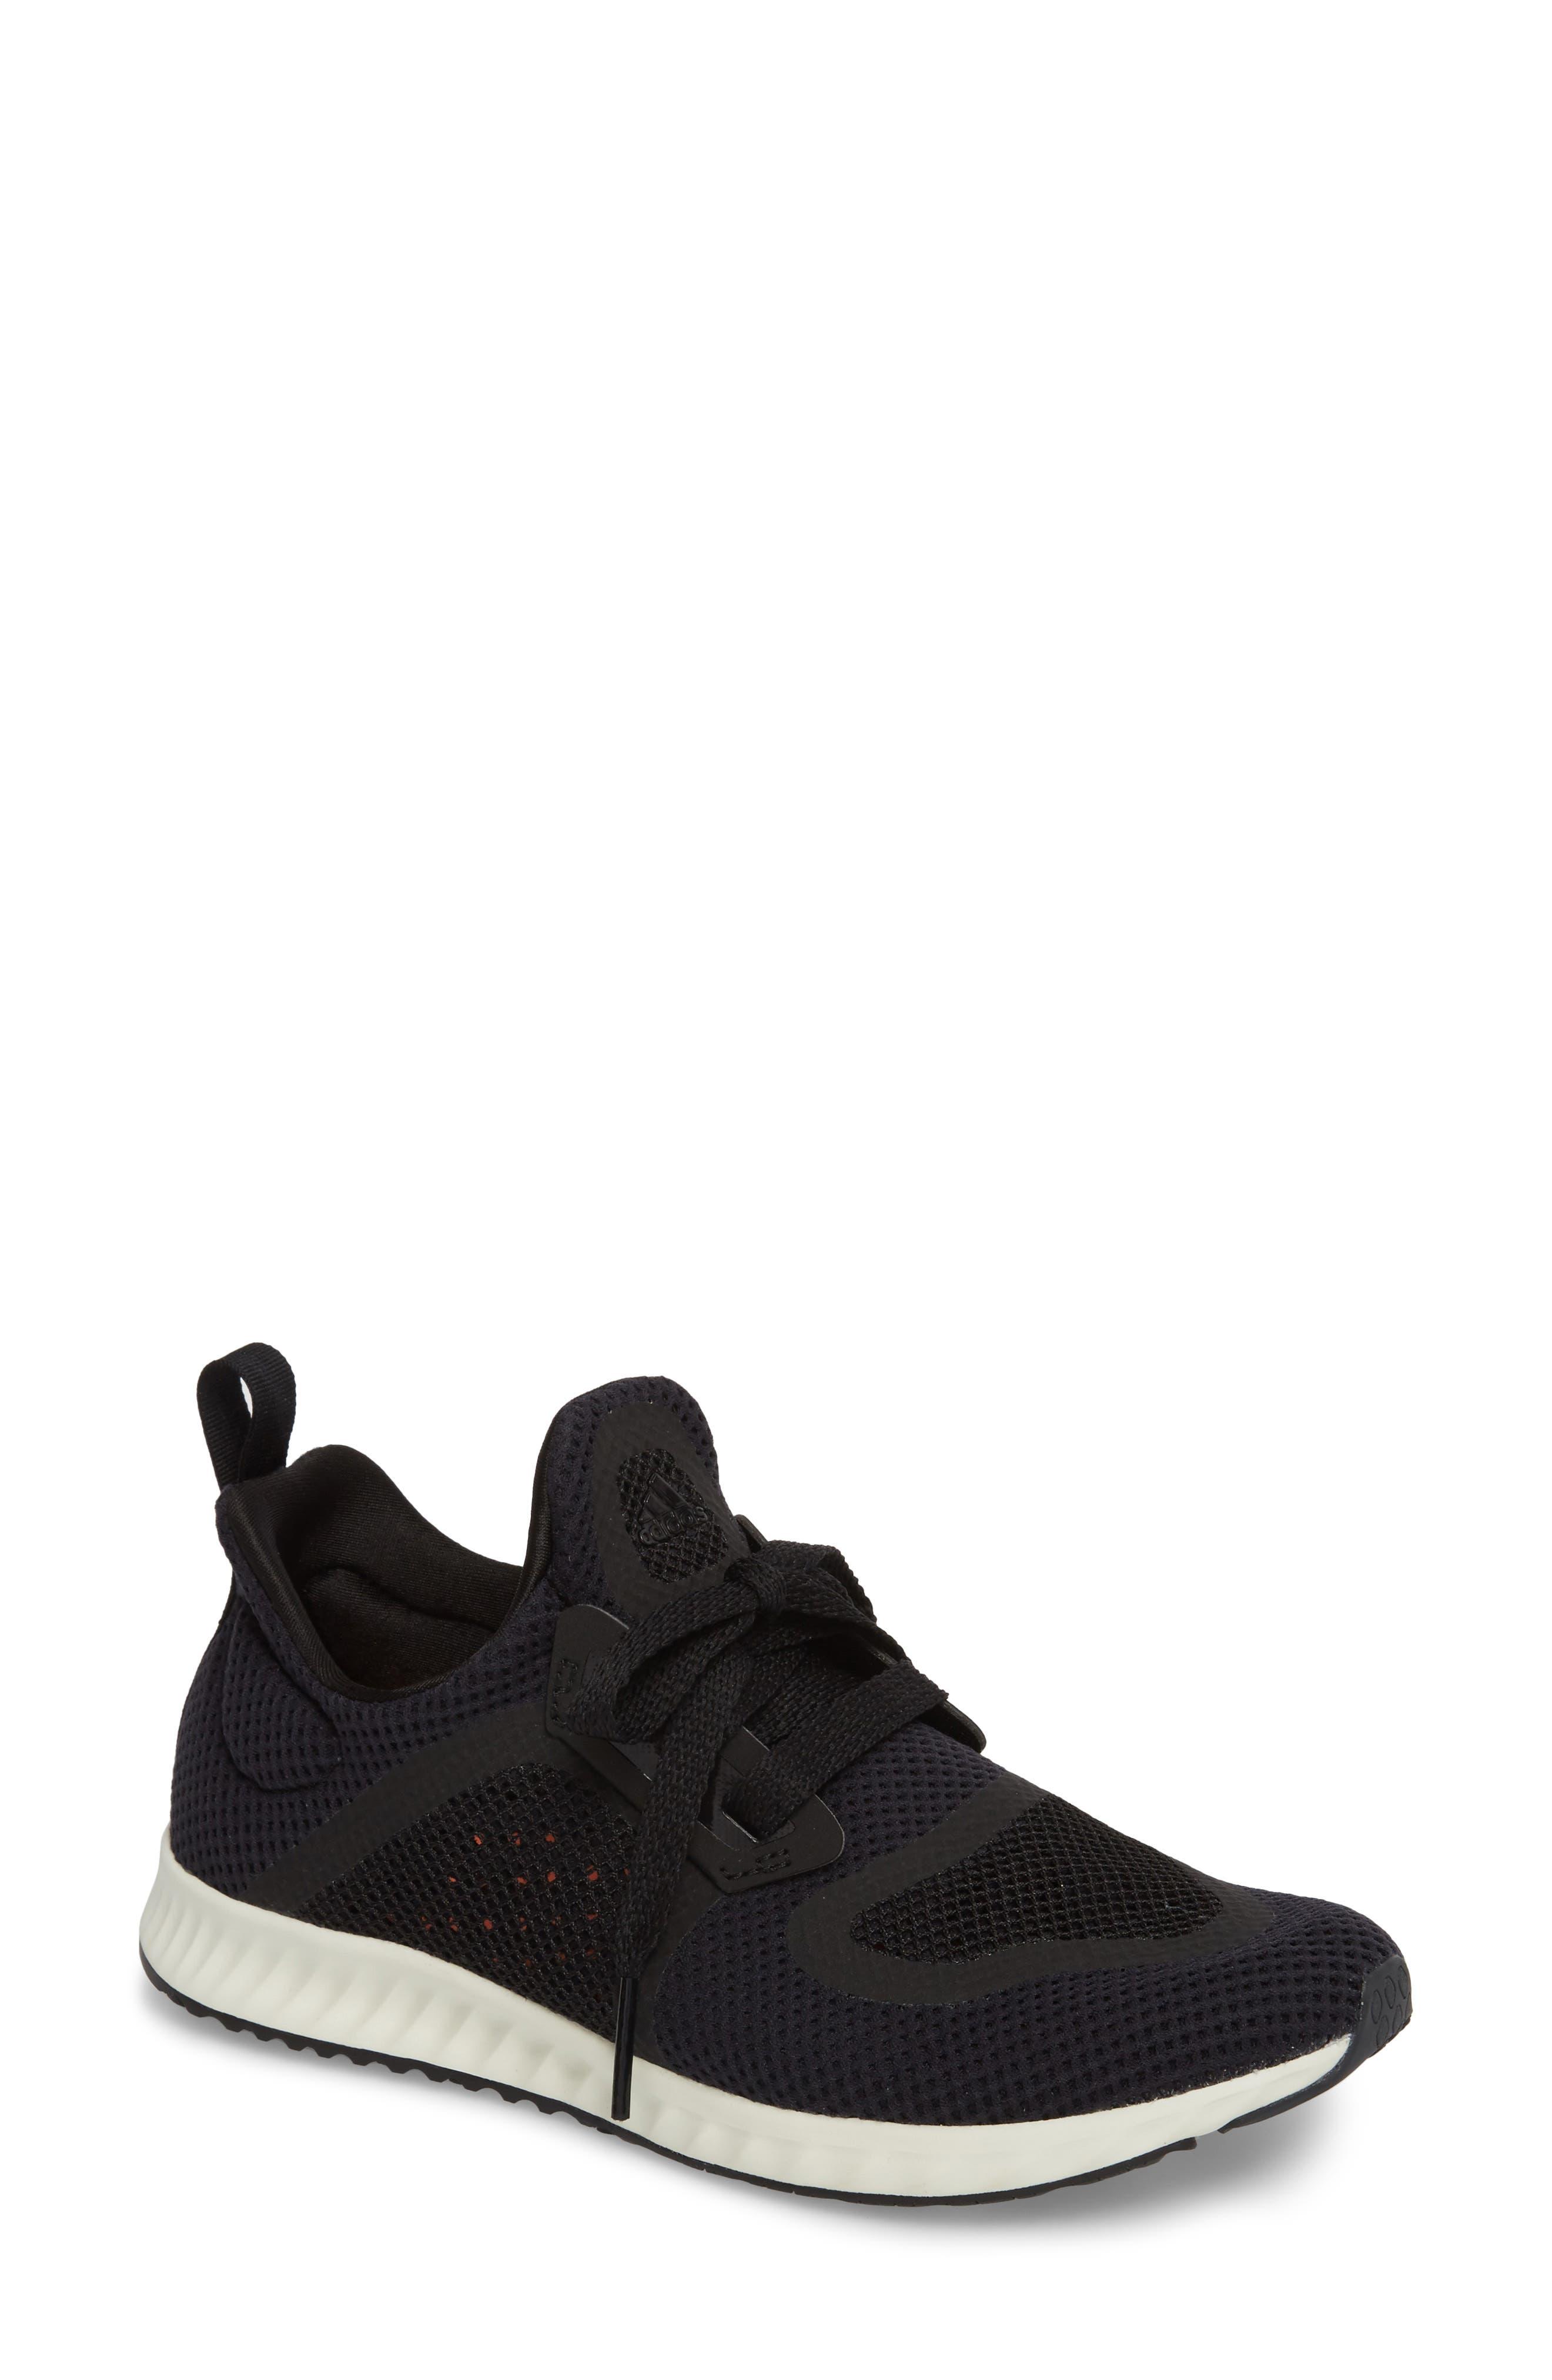 Alternate Image 1 Selected - adidas Edge Lux Clima Running Shoe (Women)